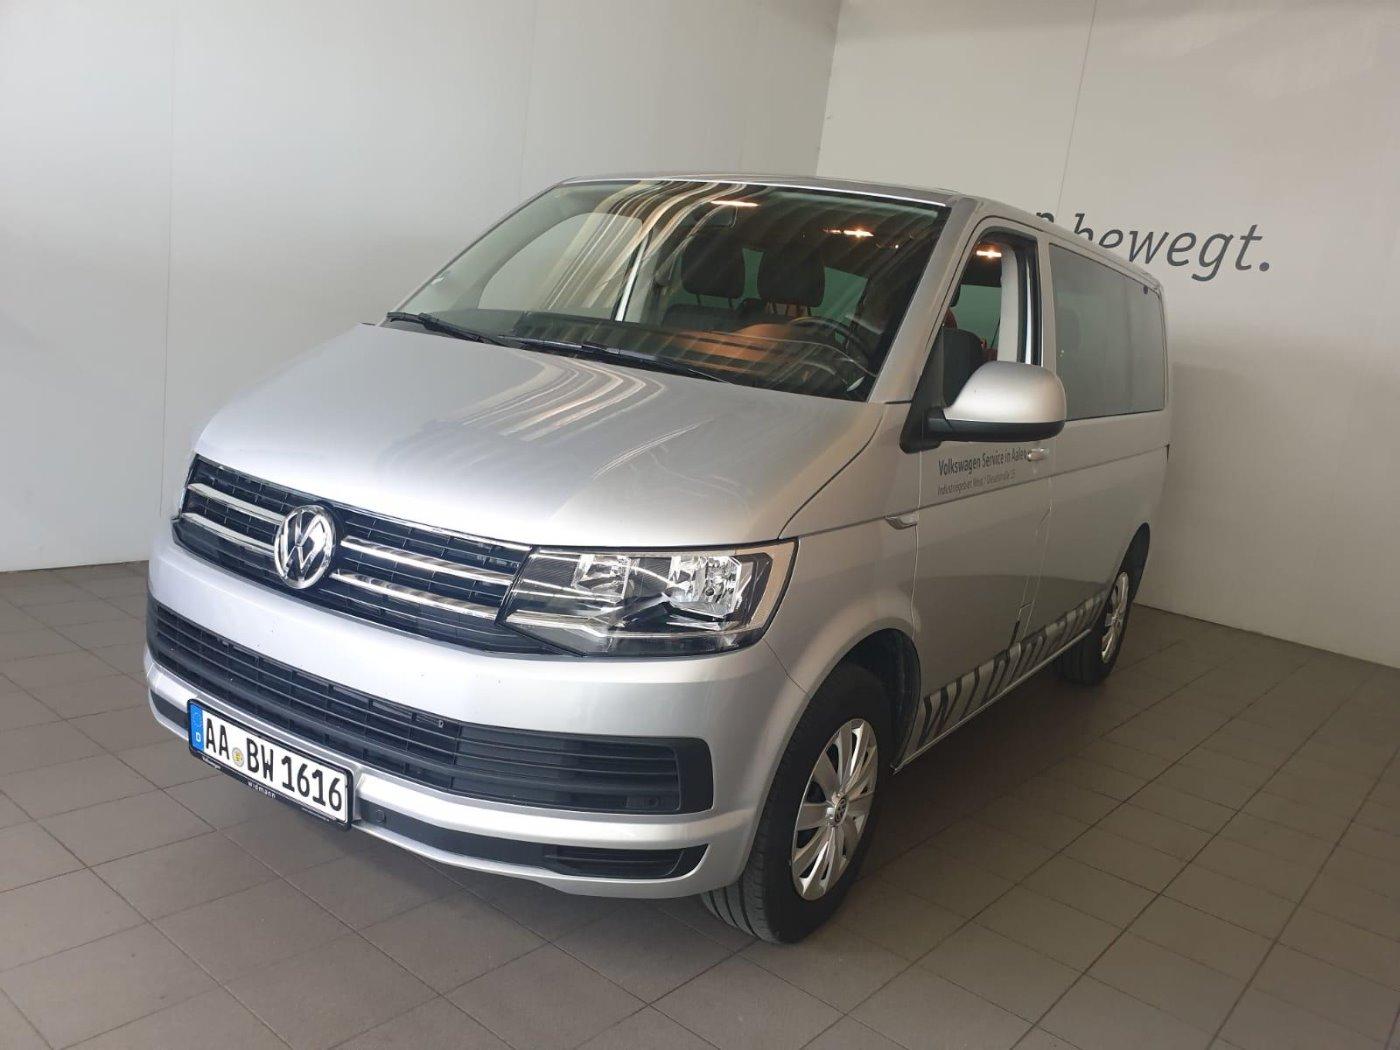 Volkswagen Caravelle Comfortline Motor: 2.0 l TDI EU6 SCR B, Jahr 2019, Diesel